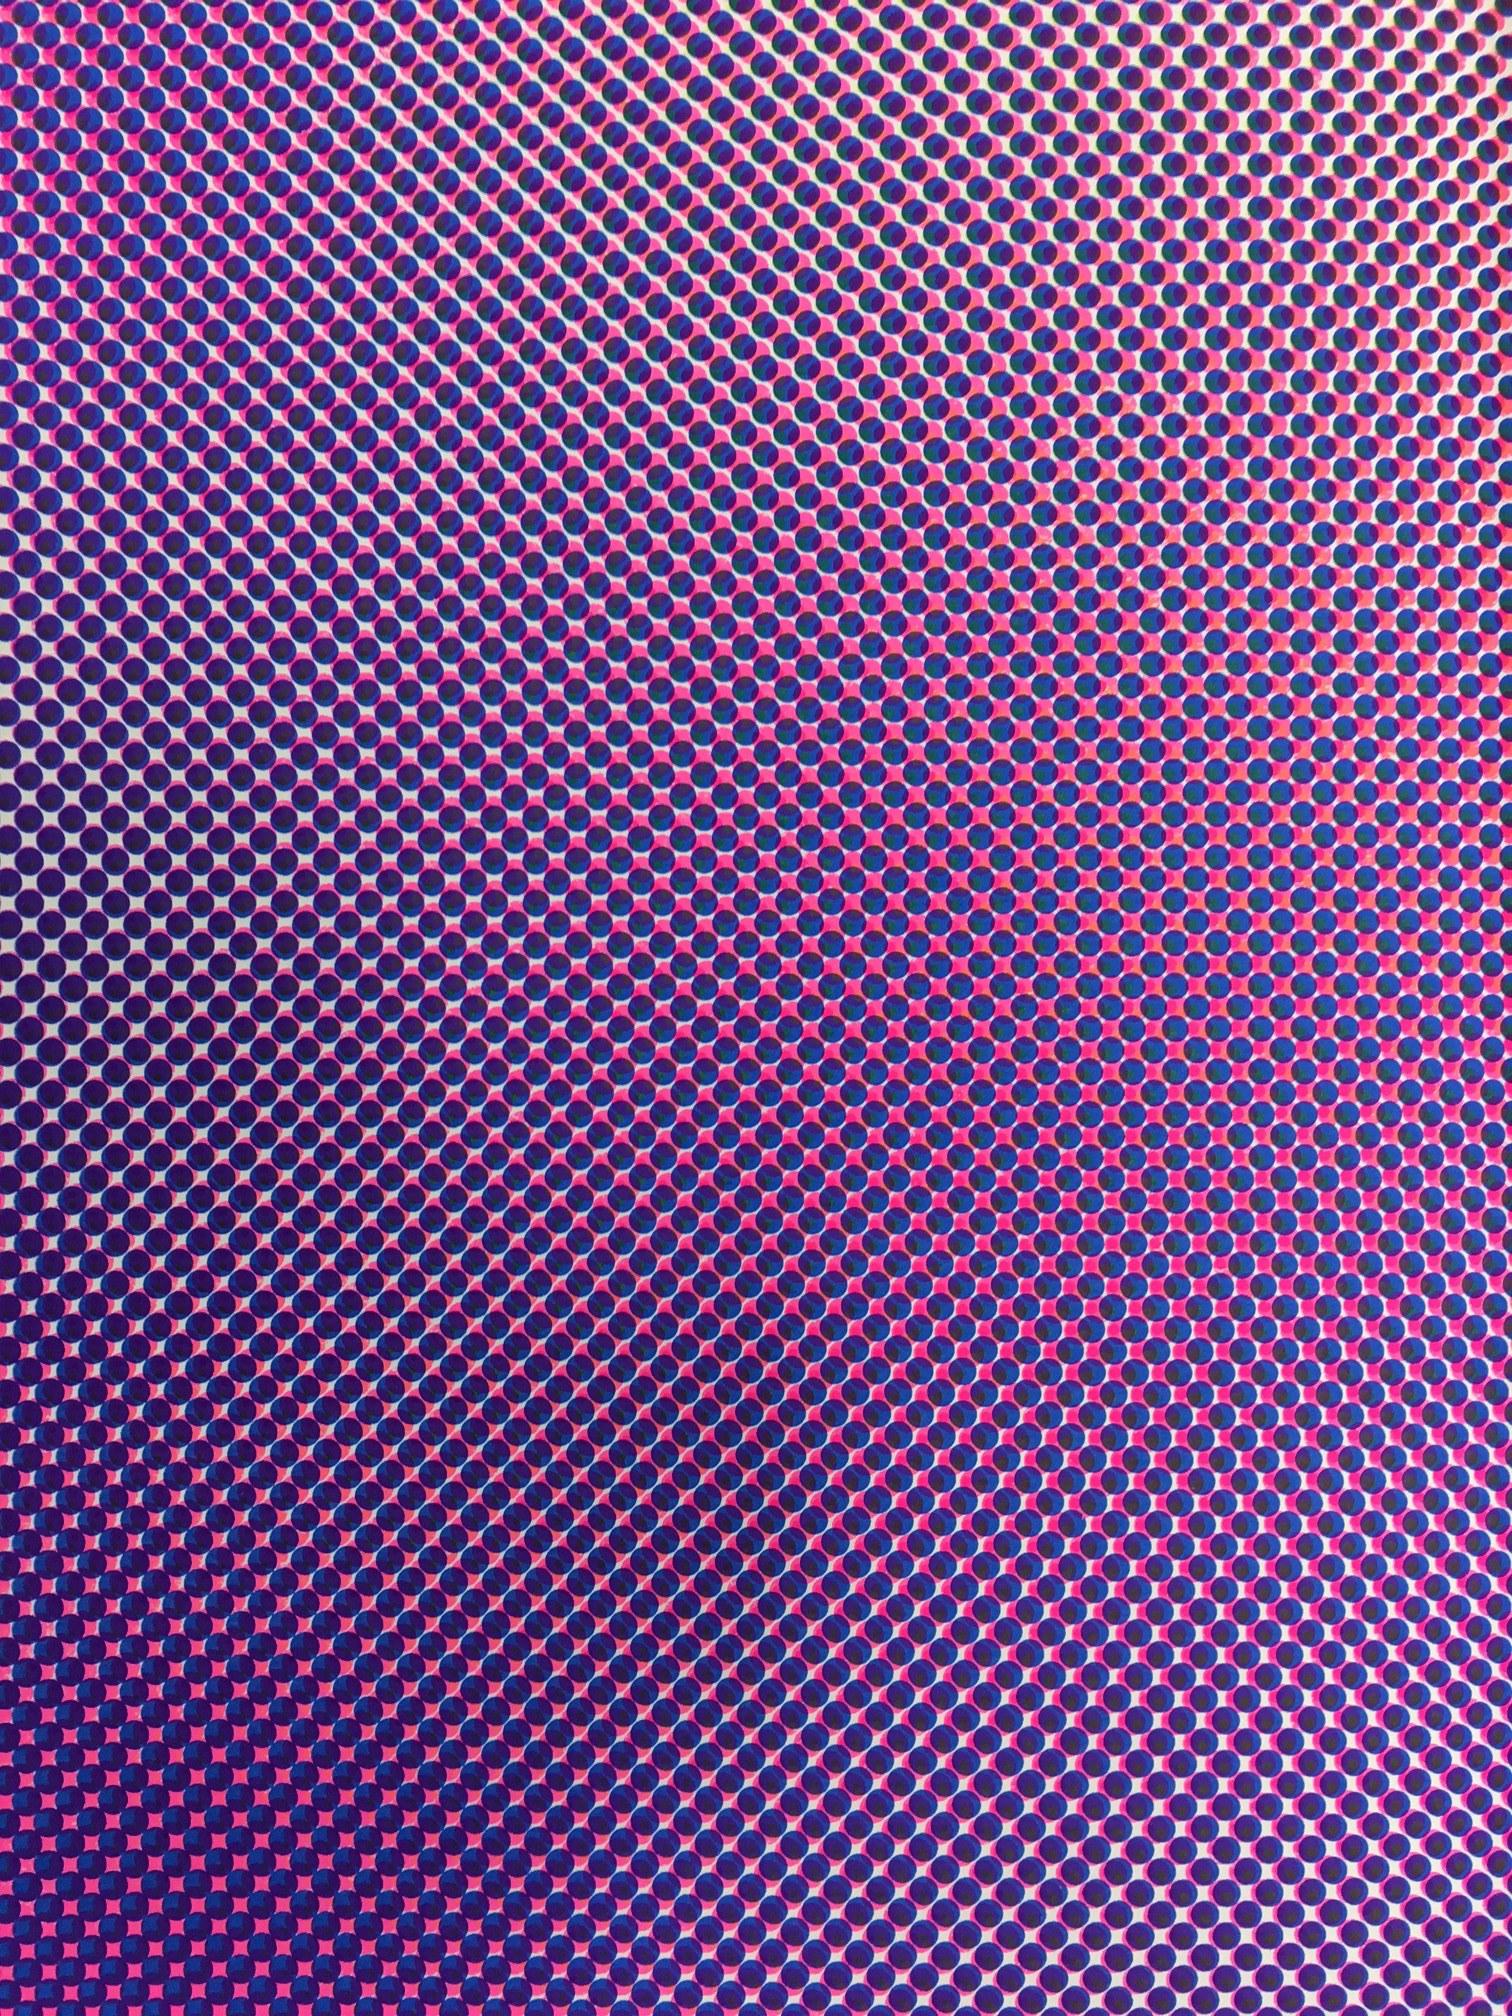 Bruno Vandenburghe , screen print (detail), 2016